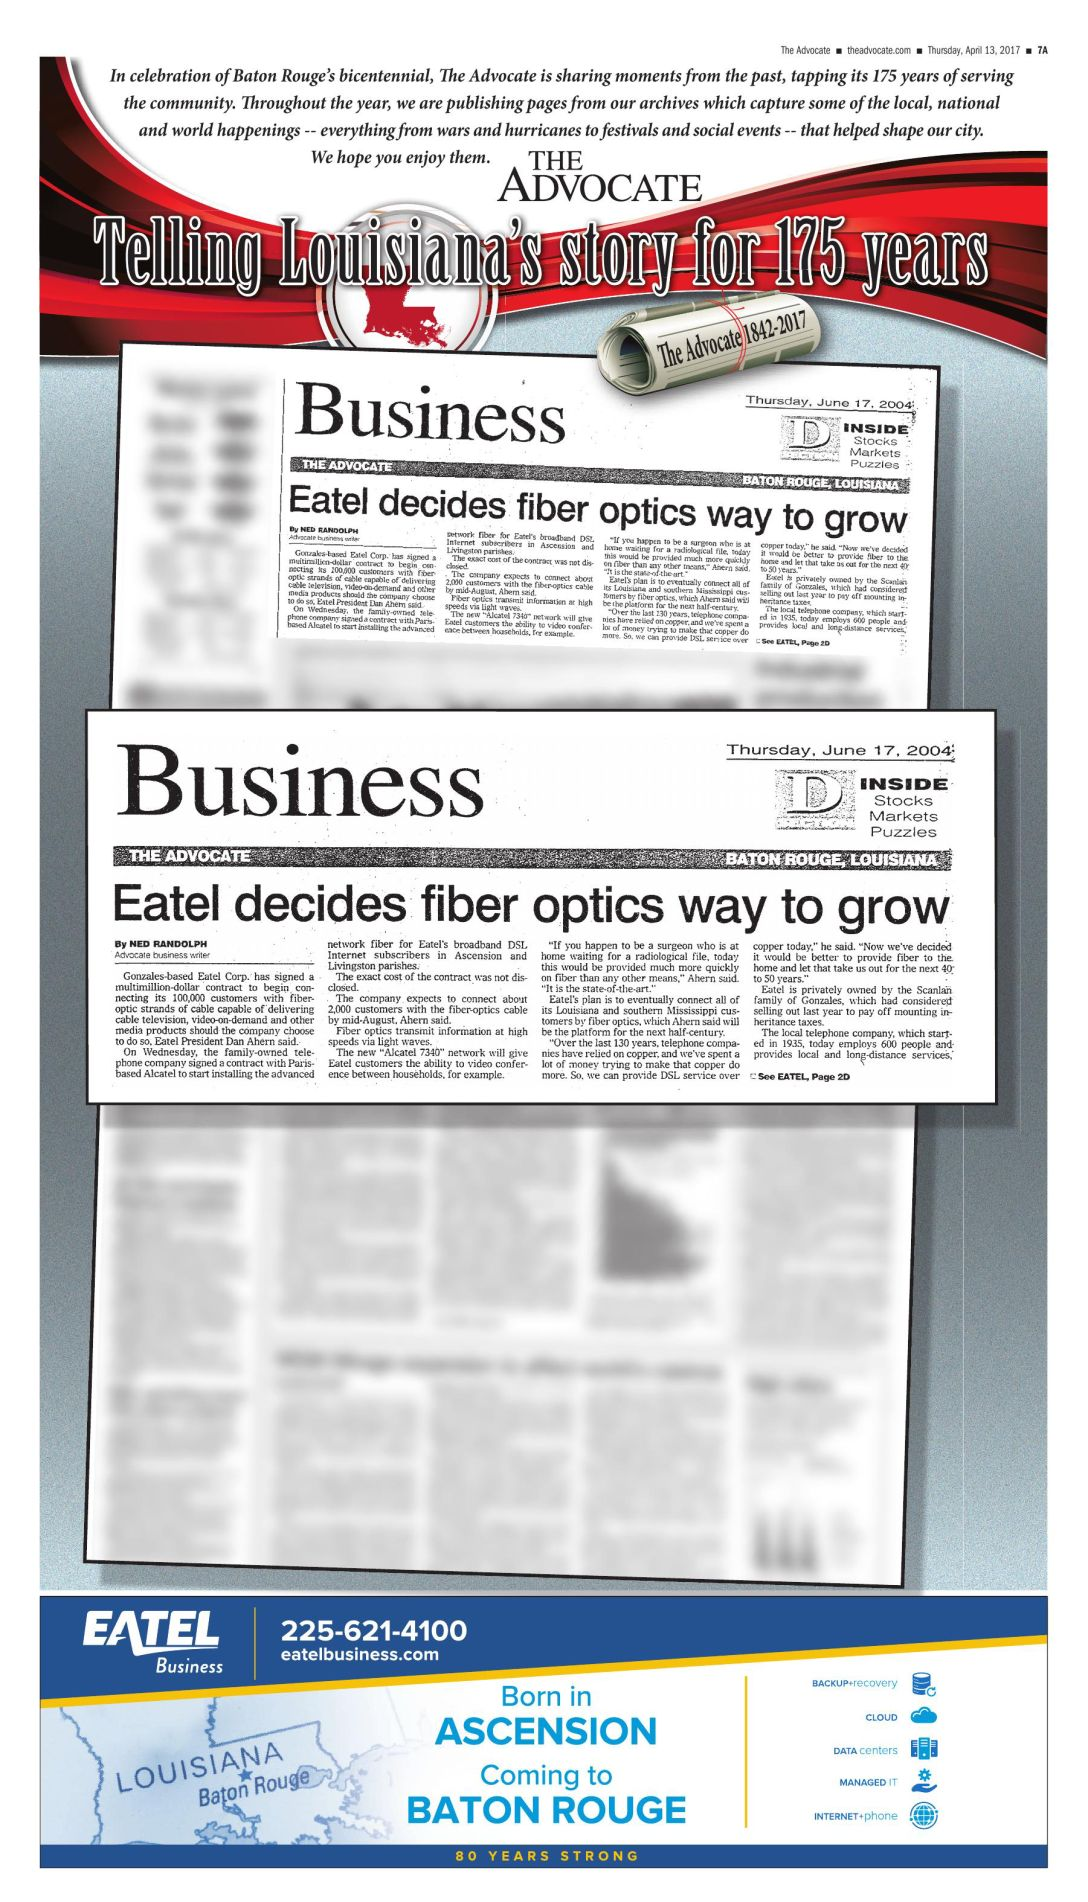 Eatel decides fiber optix way to grow